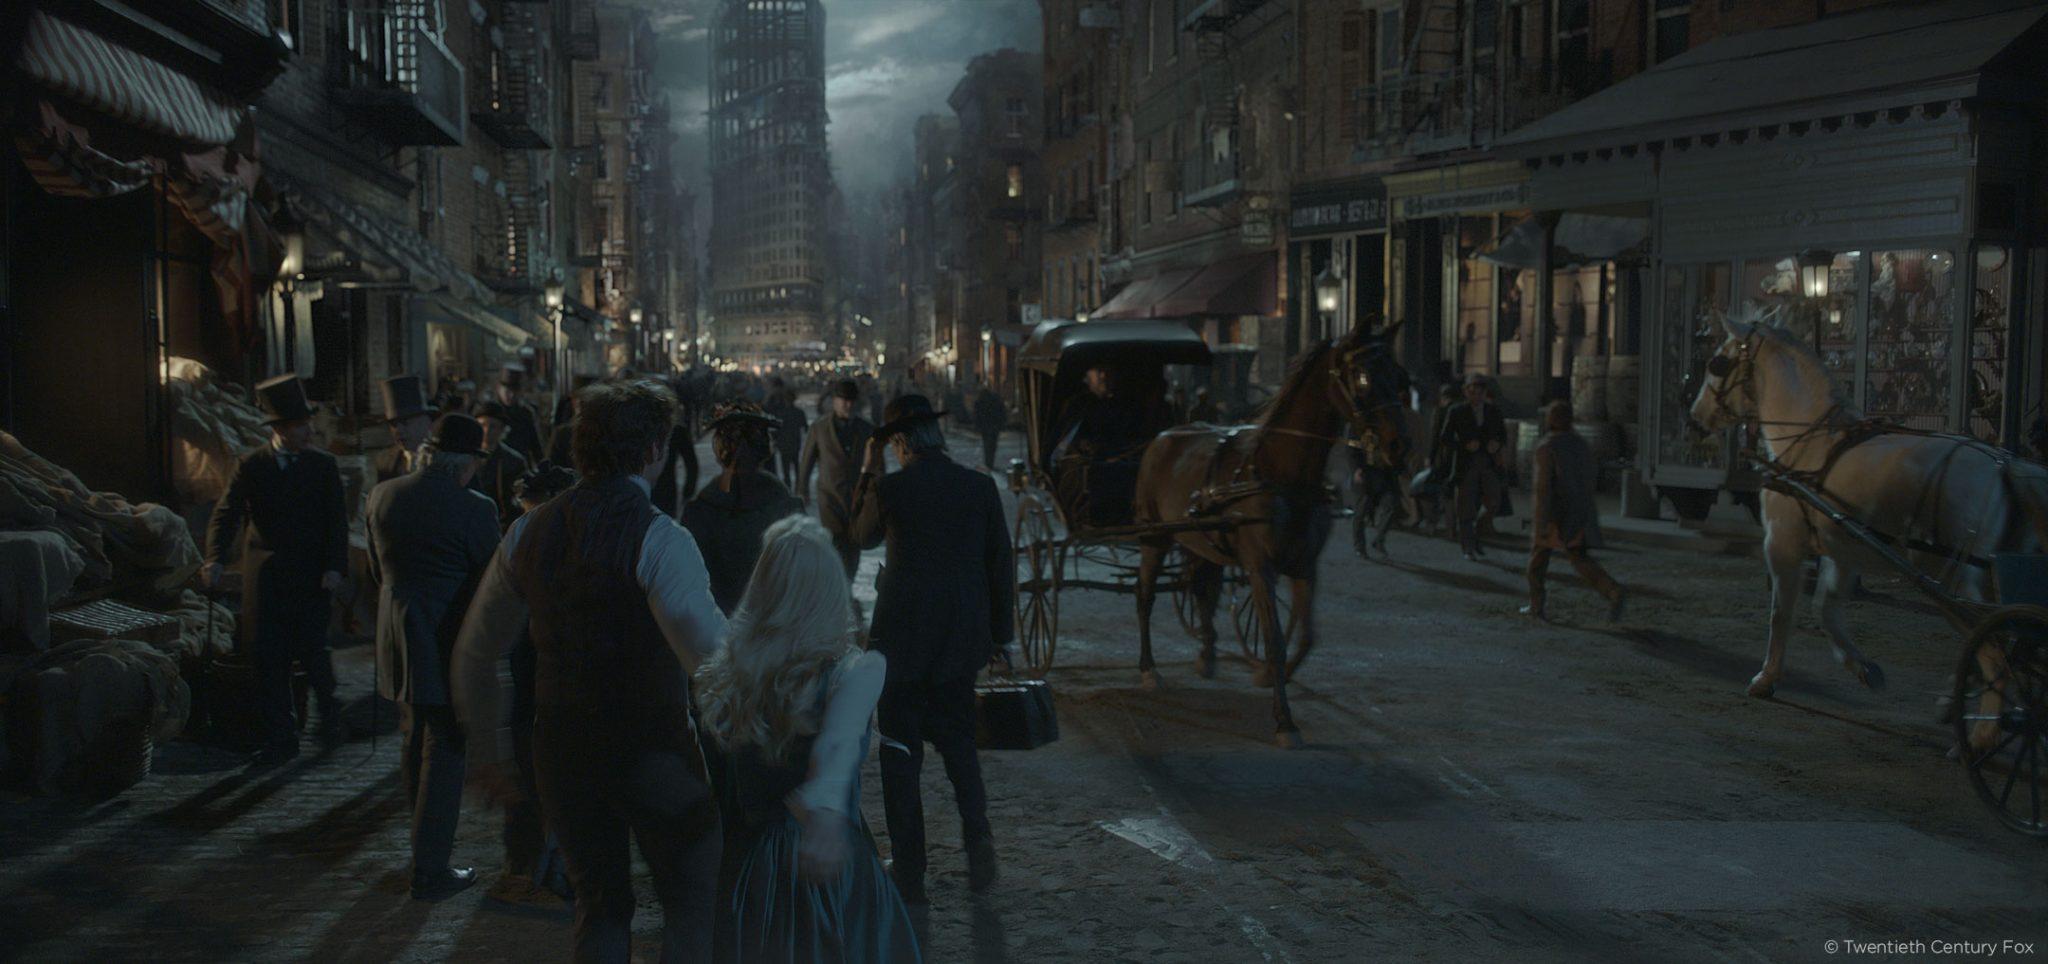 the-greatest-showman-street-walkers